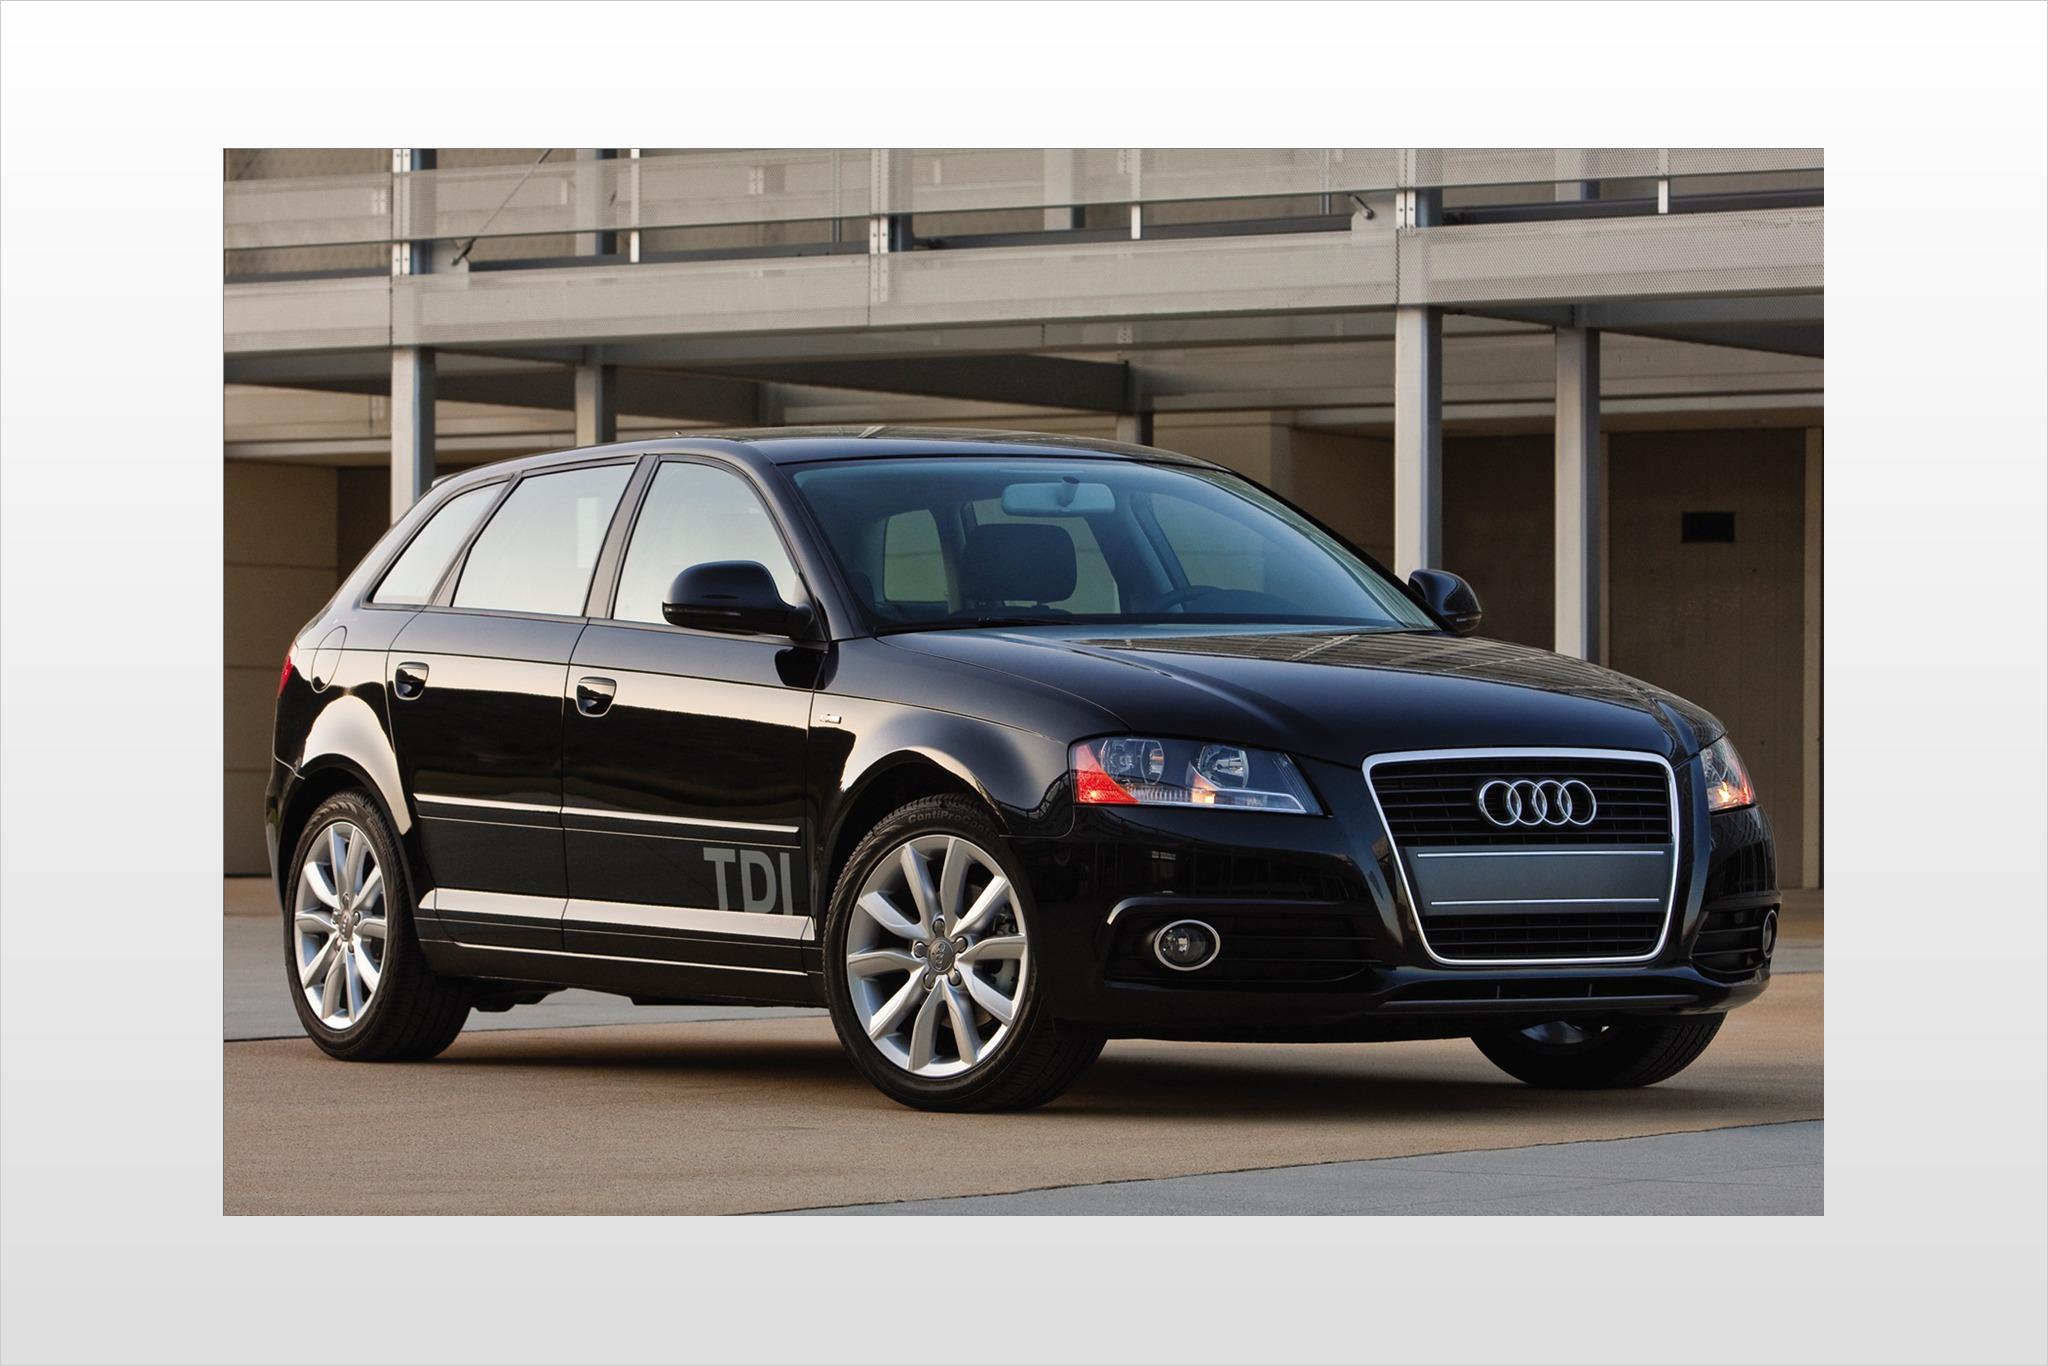 2010 Audi A3 Image 5